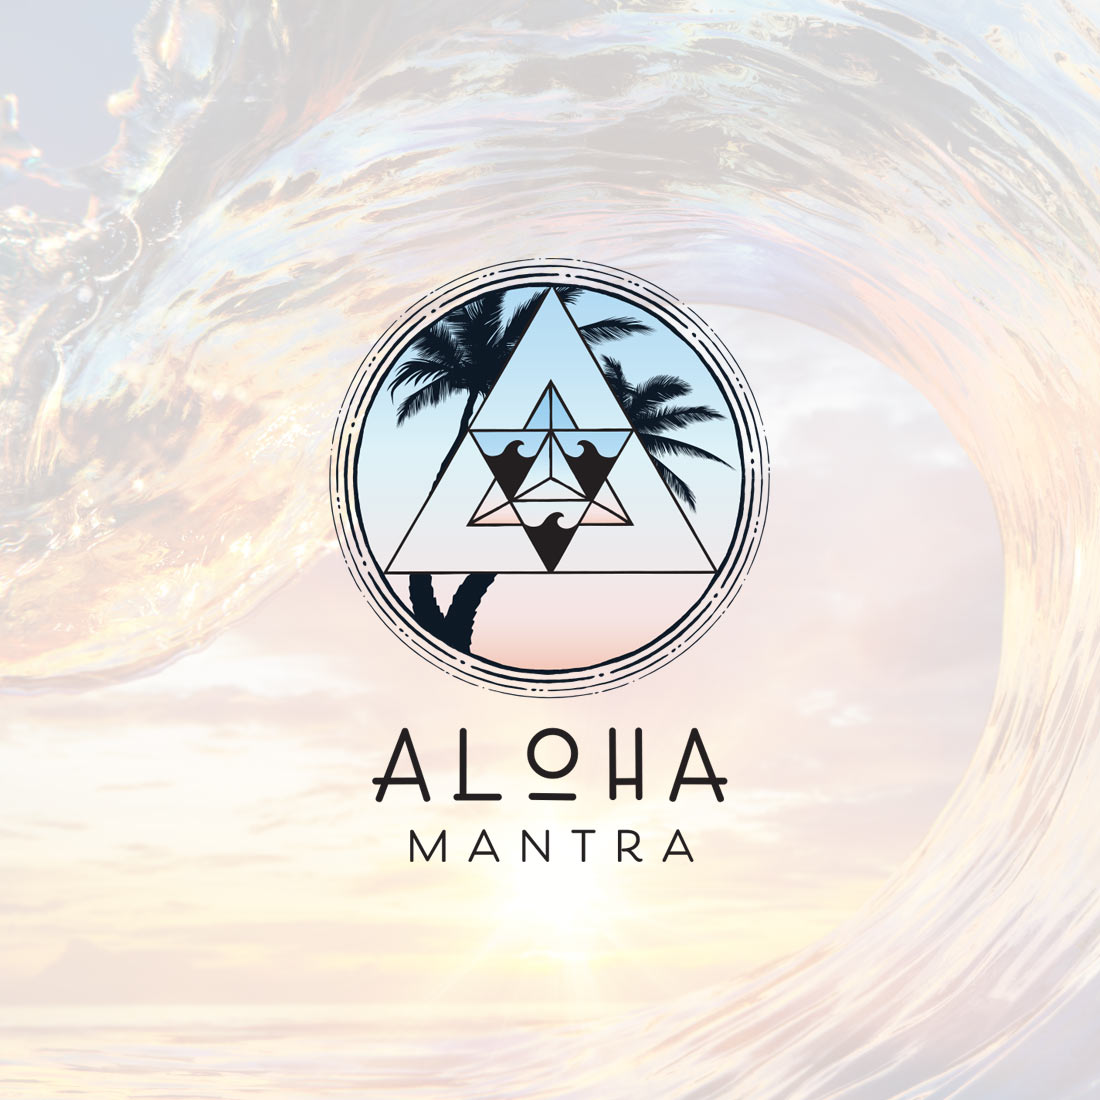 aloha mantra small business logo design hawaii